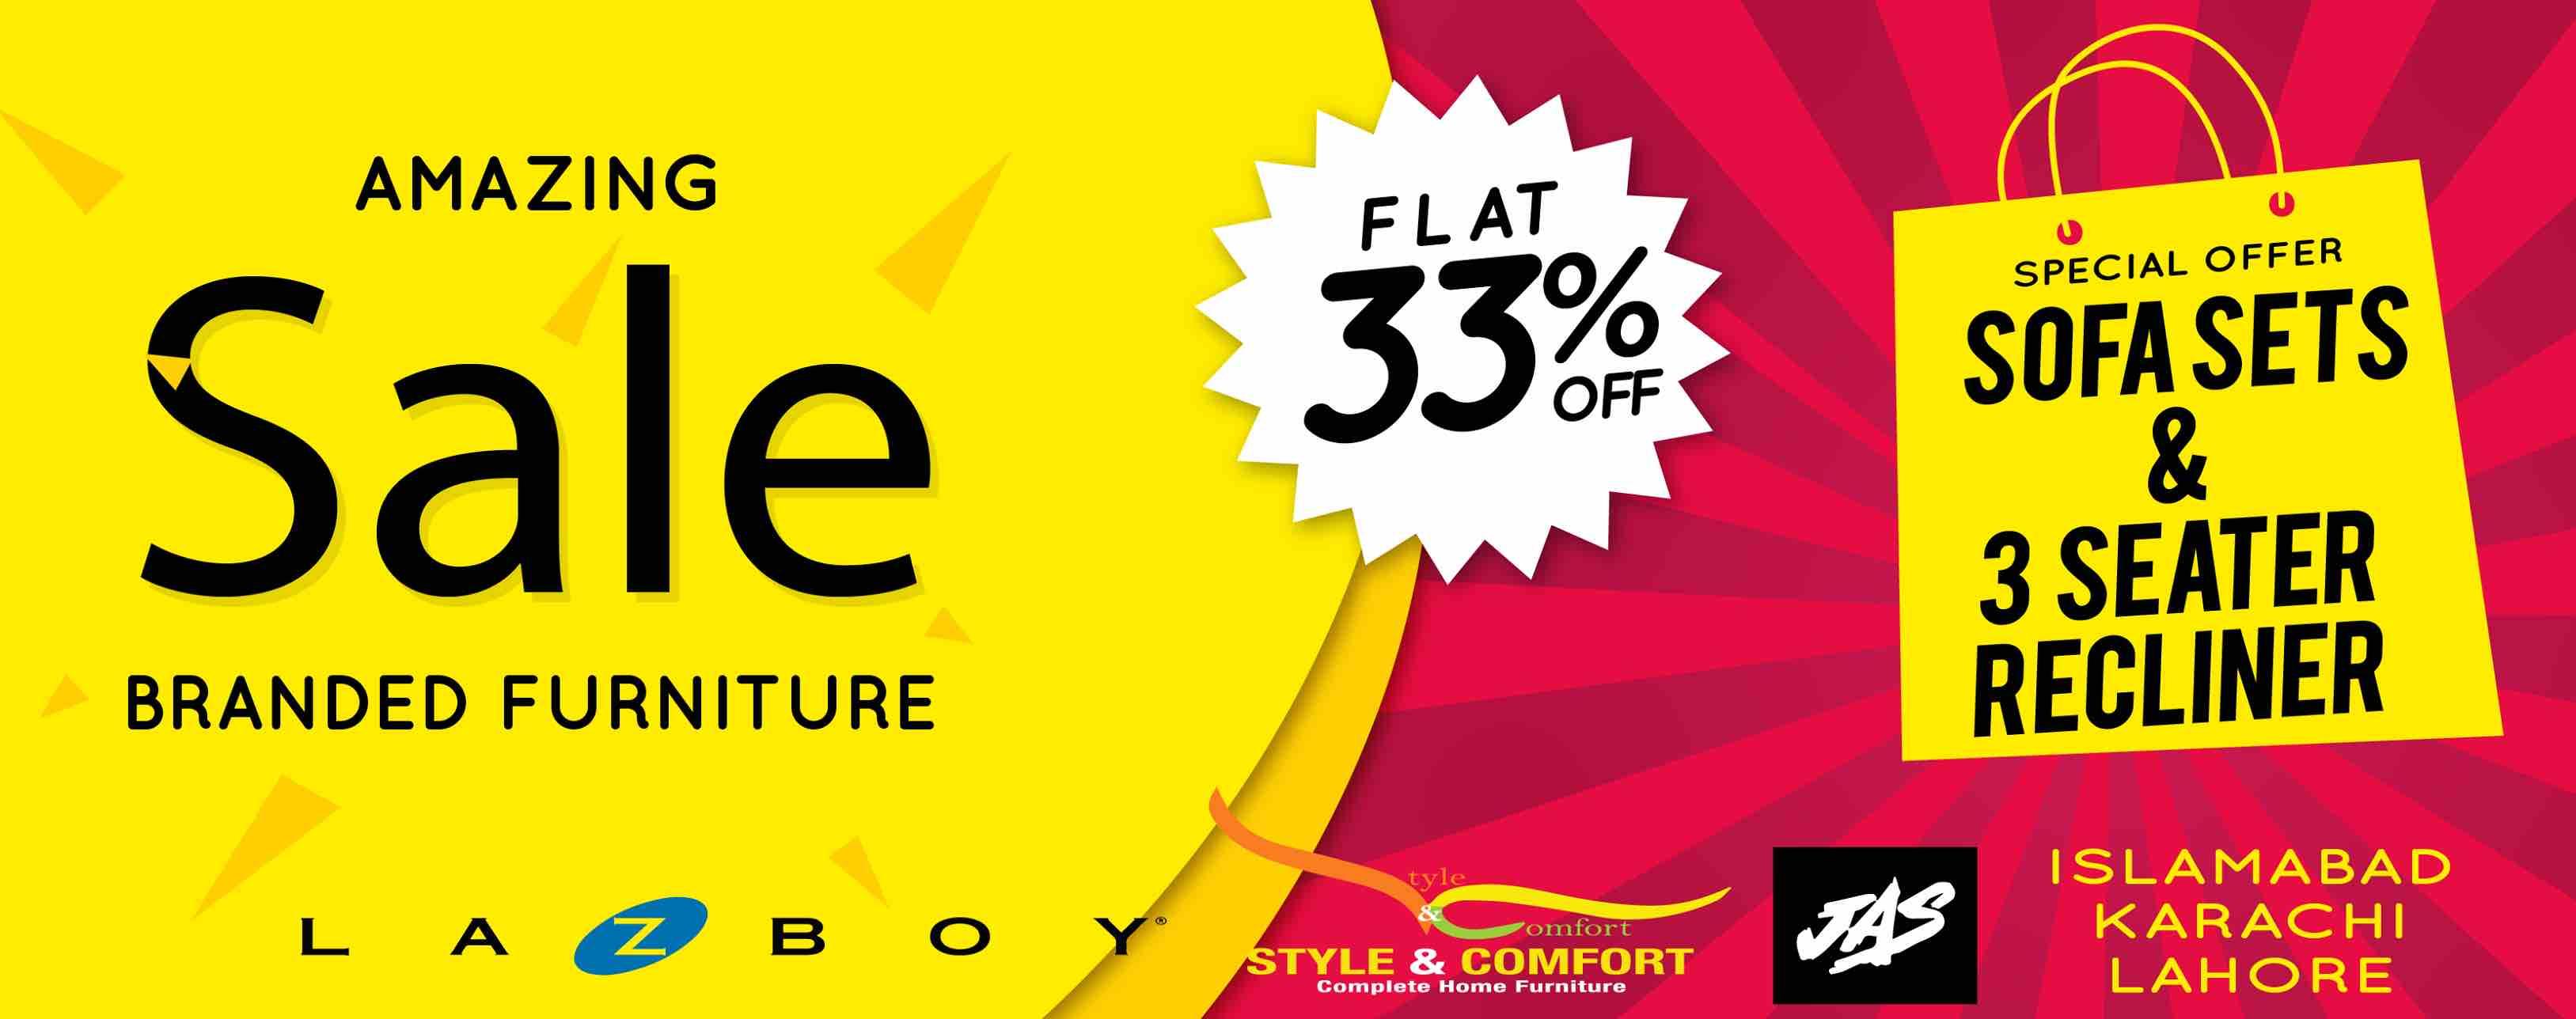 Style & Comfort - Amazing Sale